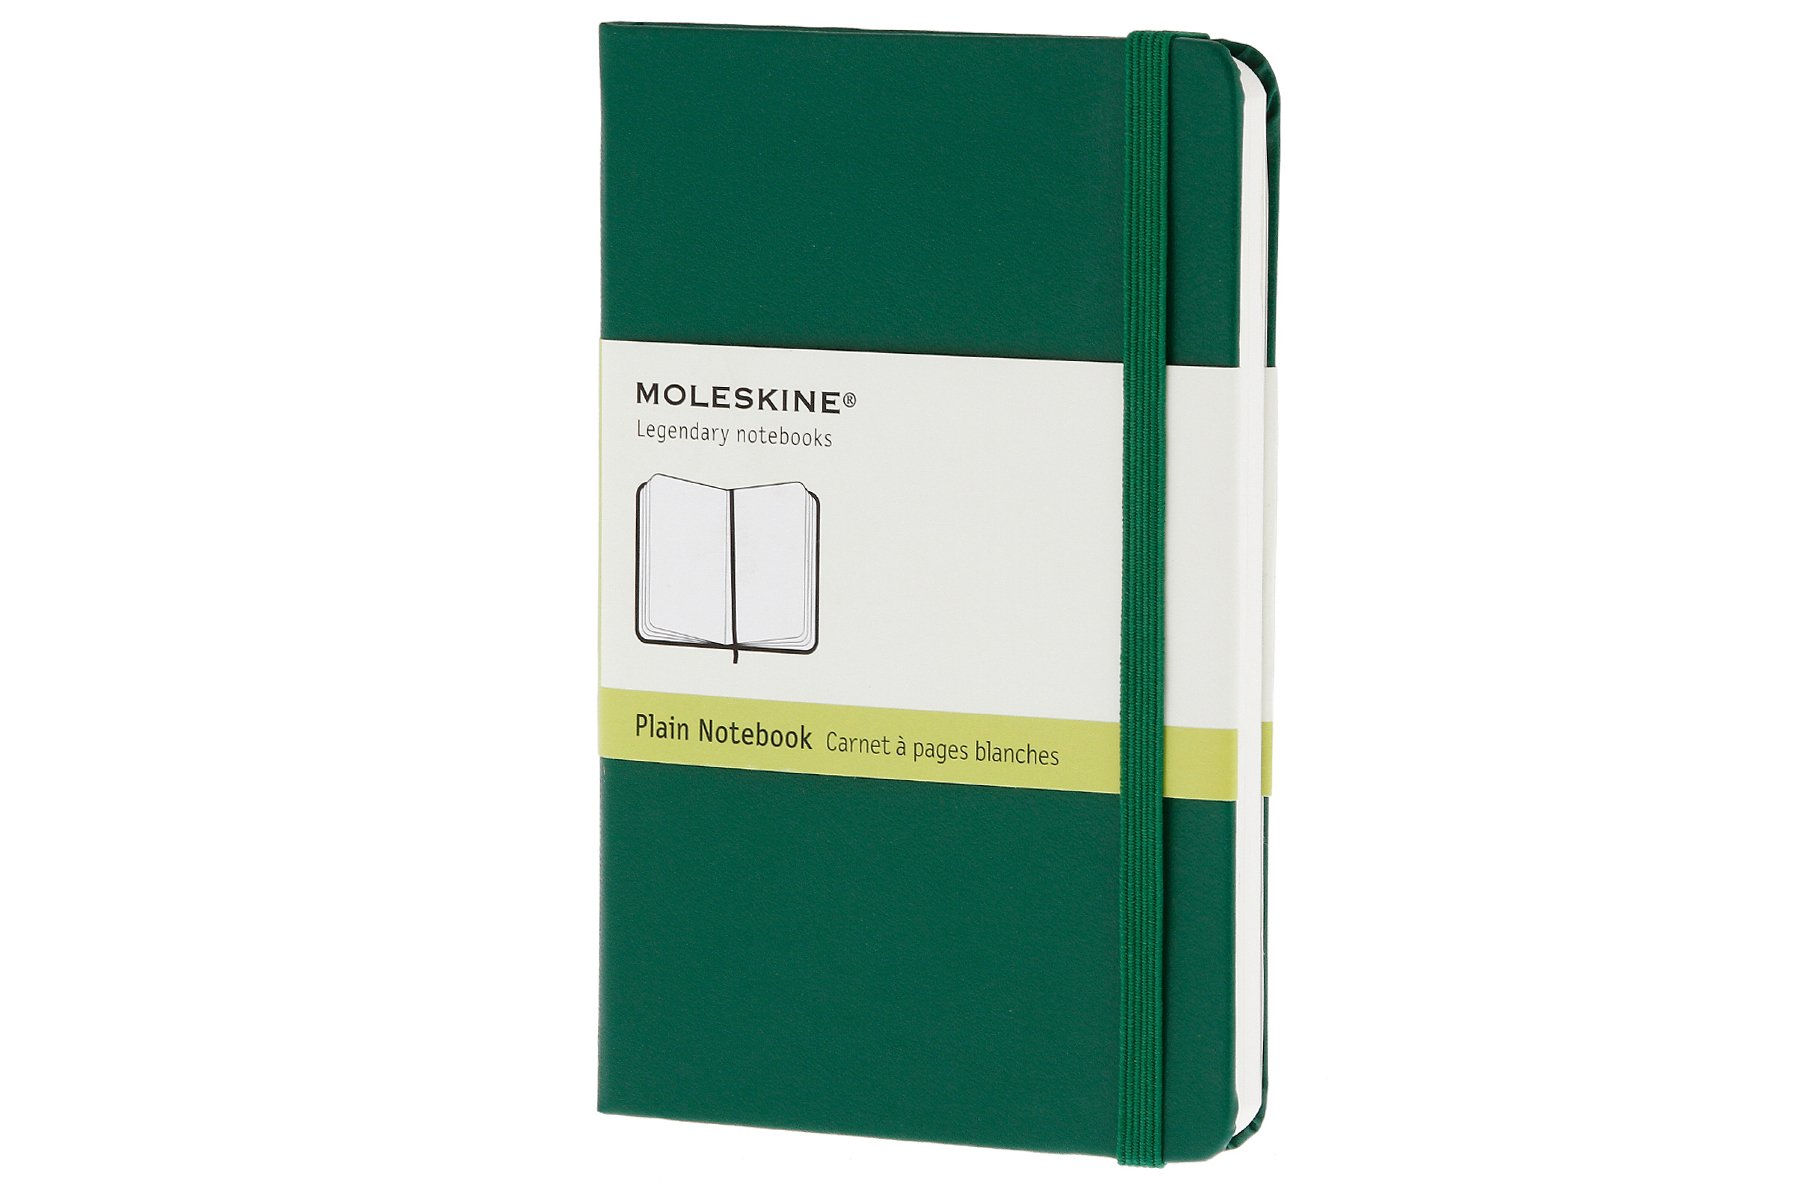 Moleskine Classic Notebook Pocket Willow